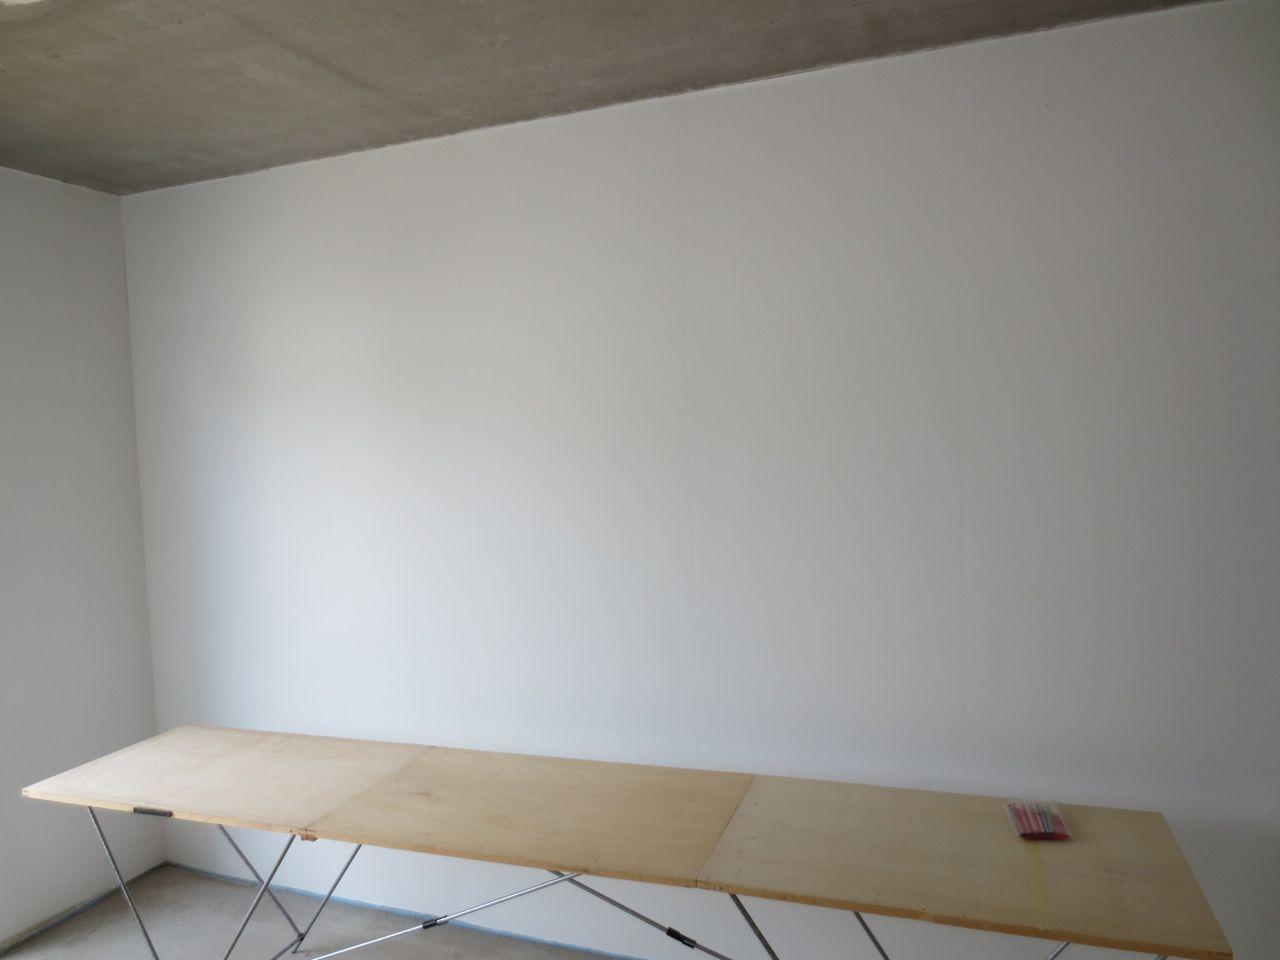 wir bauen in remagen tapeten. Black Bedroom Furniture Sets. Home Design Ideas